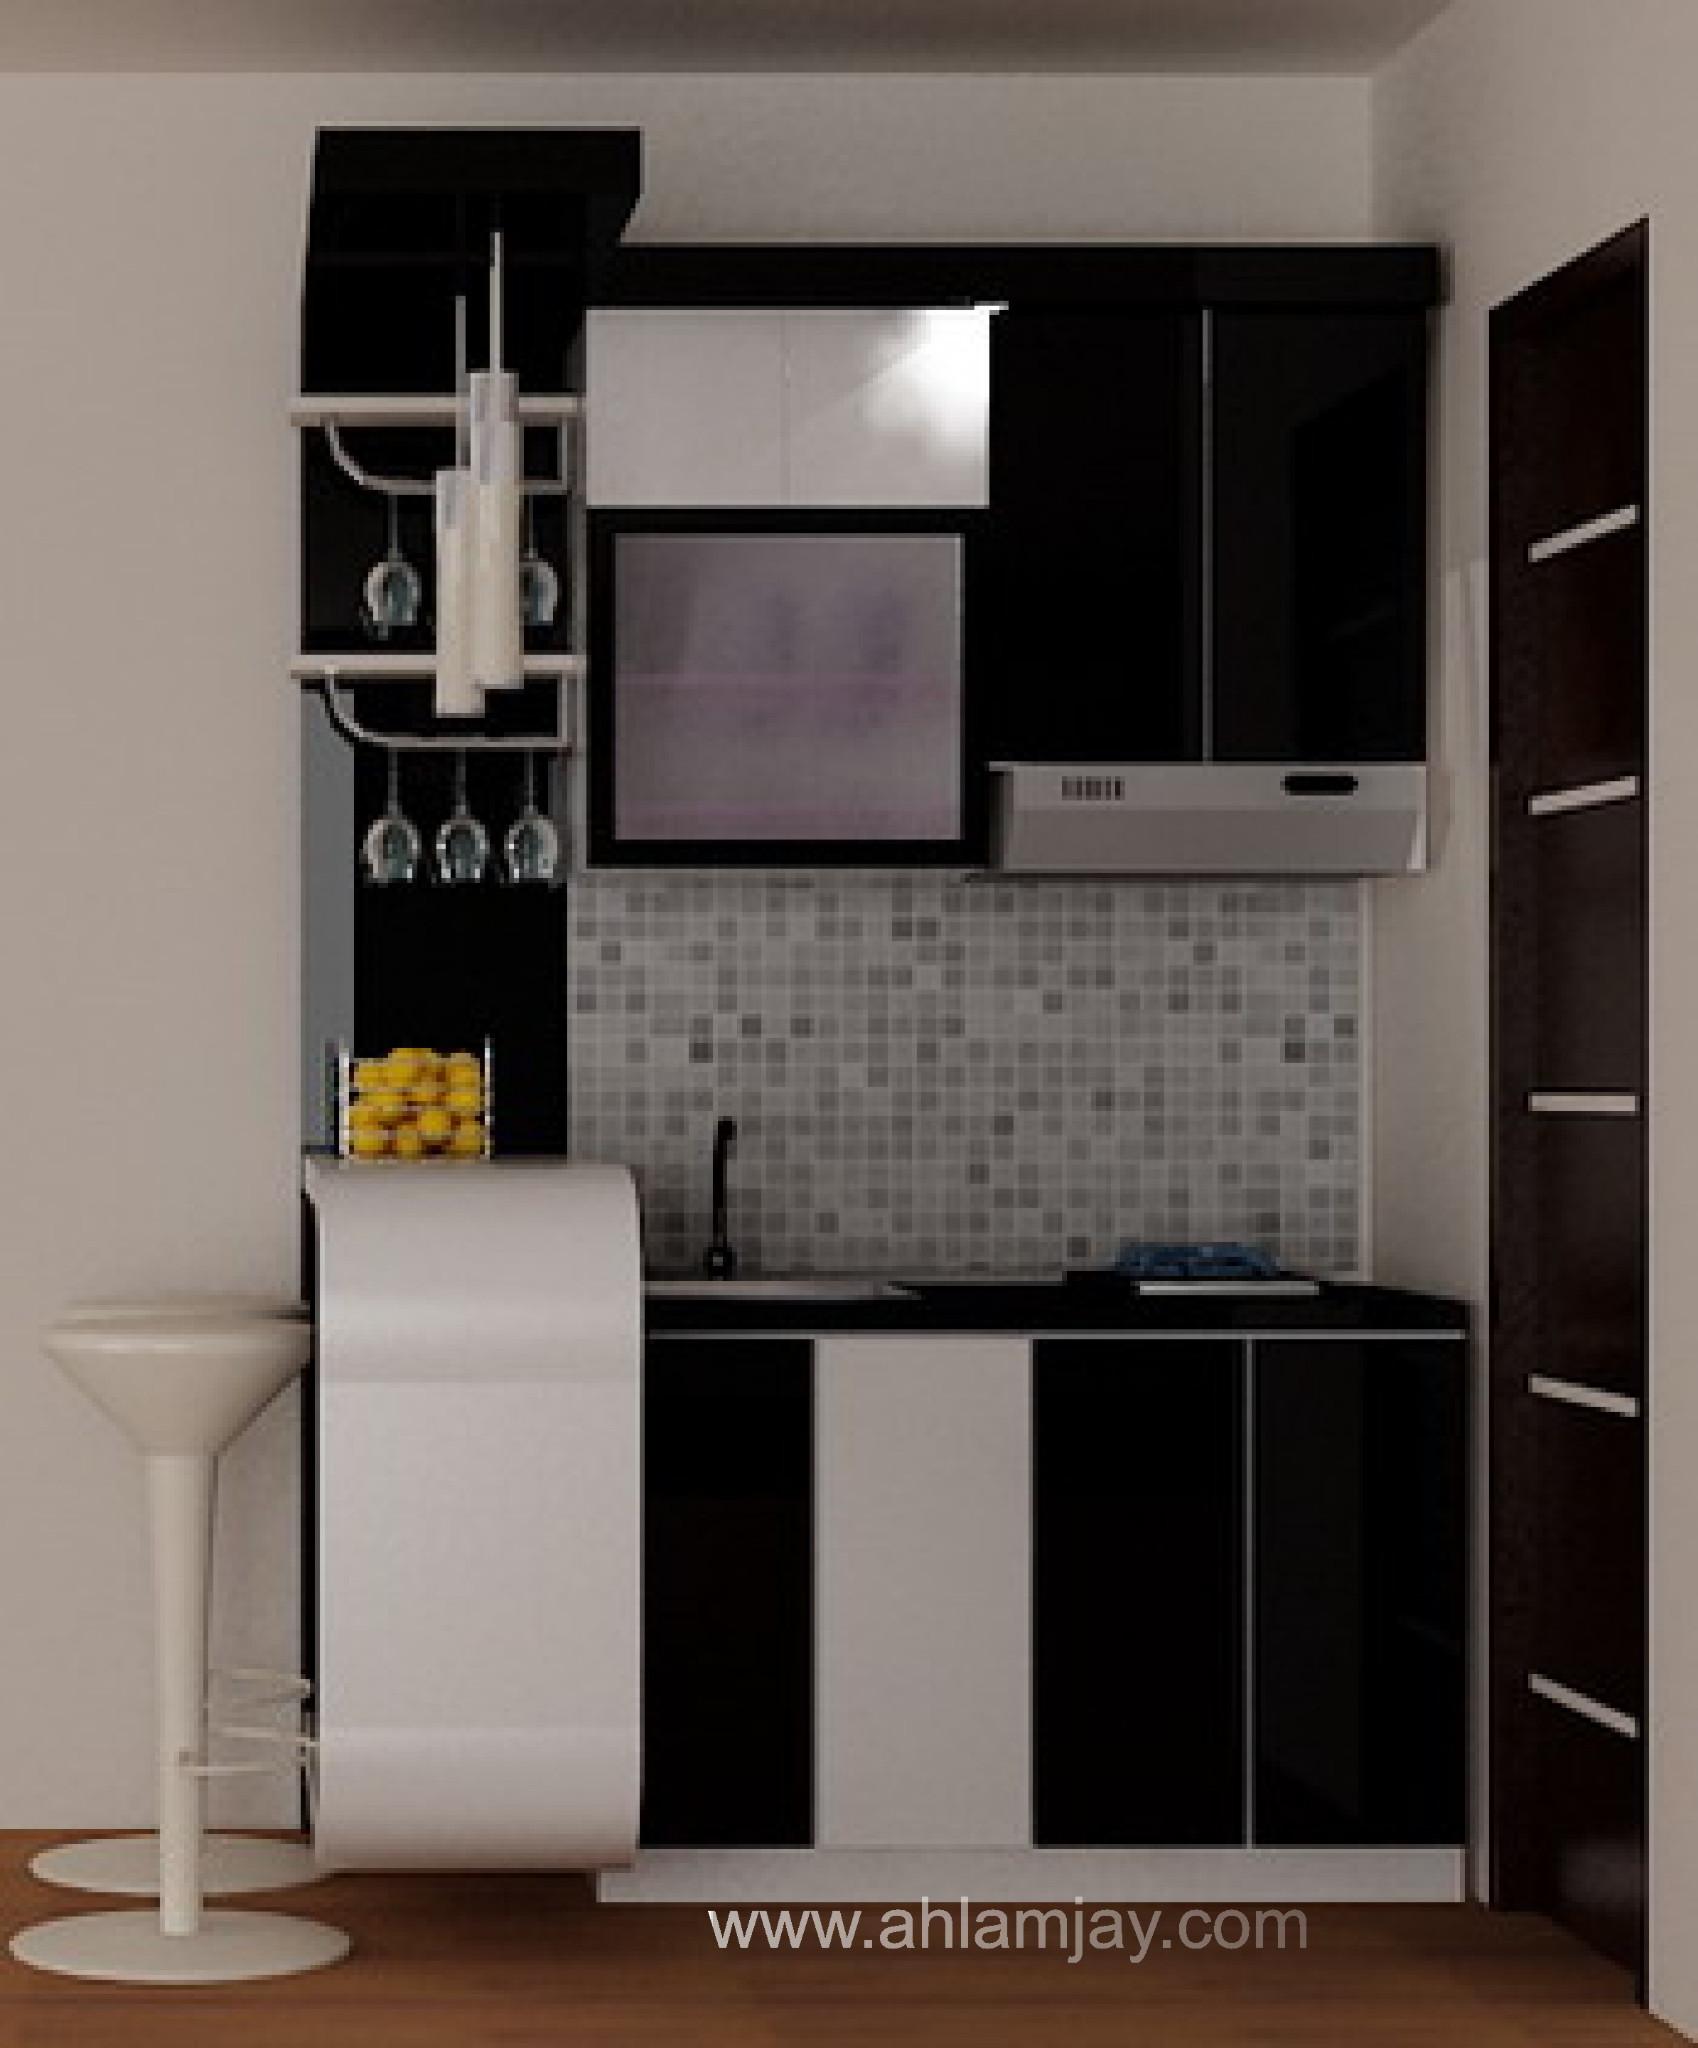 Harga Kitchen Set Murah Di Bandung Kitchen Appliances Tips And Review